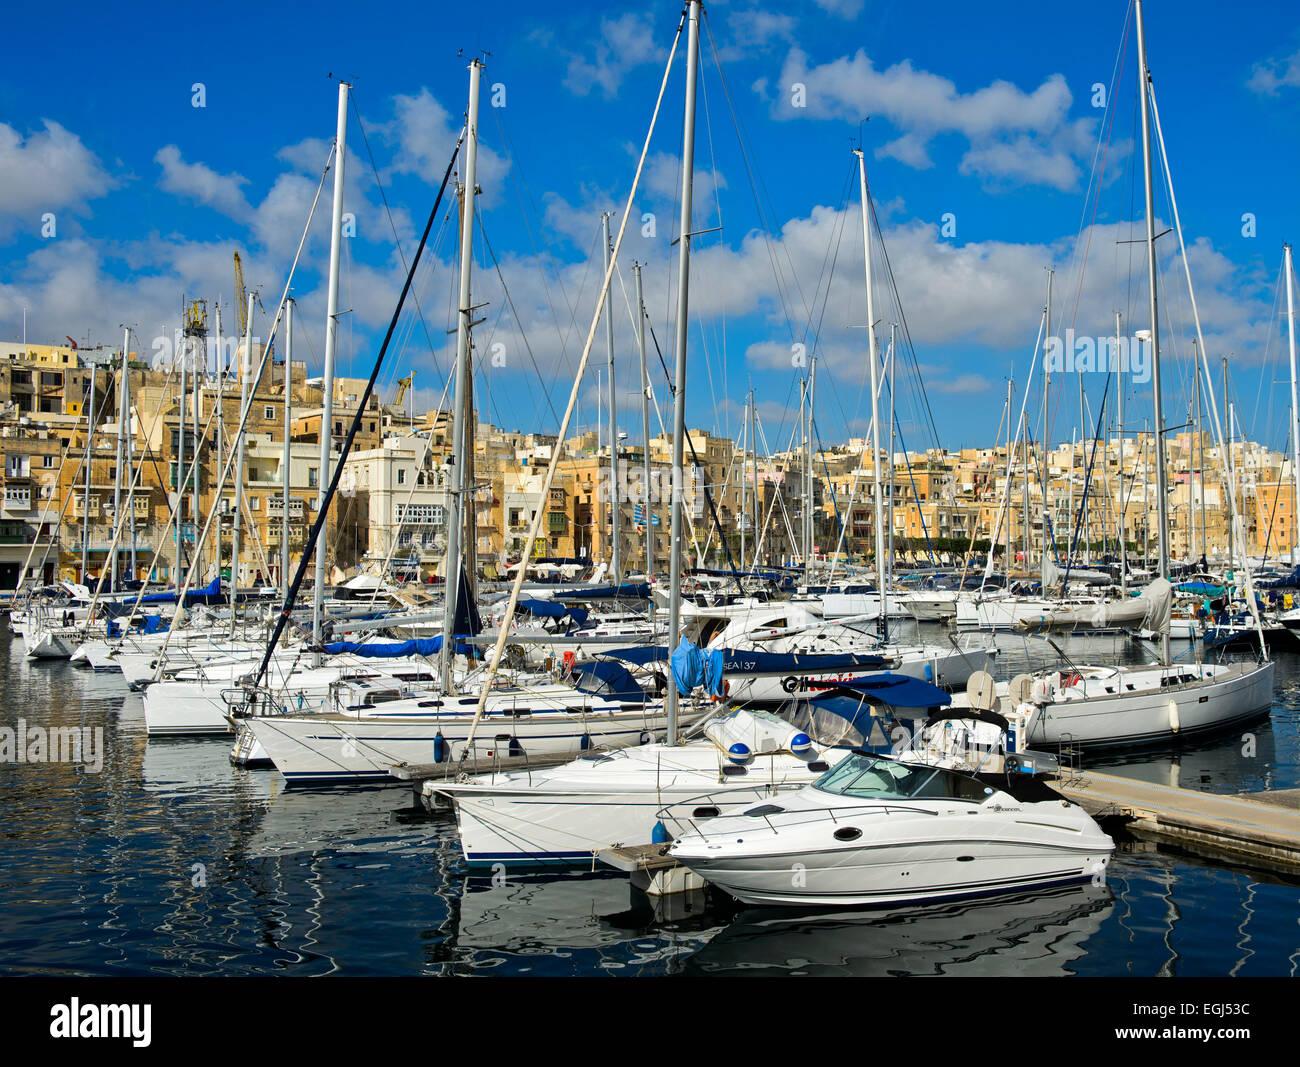 Boats in the marina of Vittorioso, view of Valletta, Malta - Stock Image